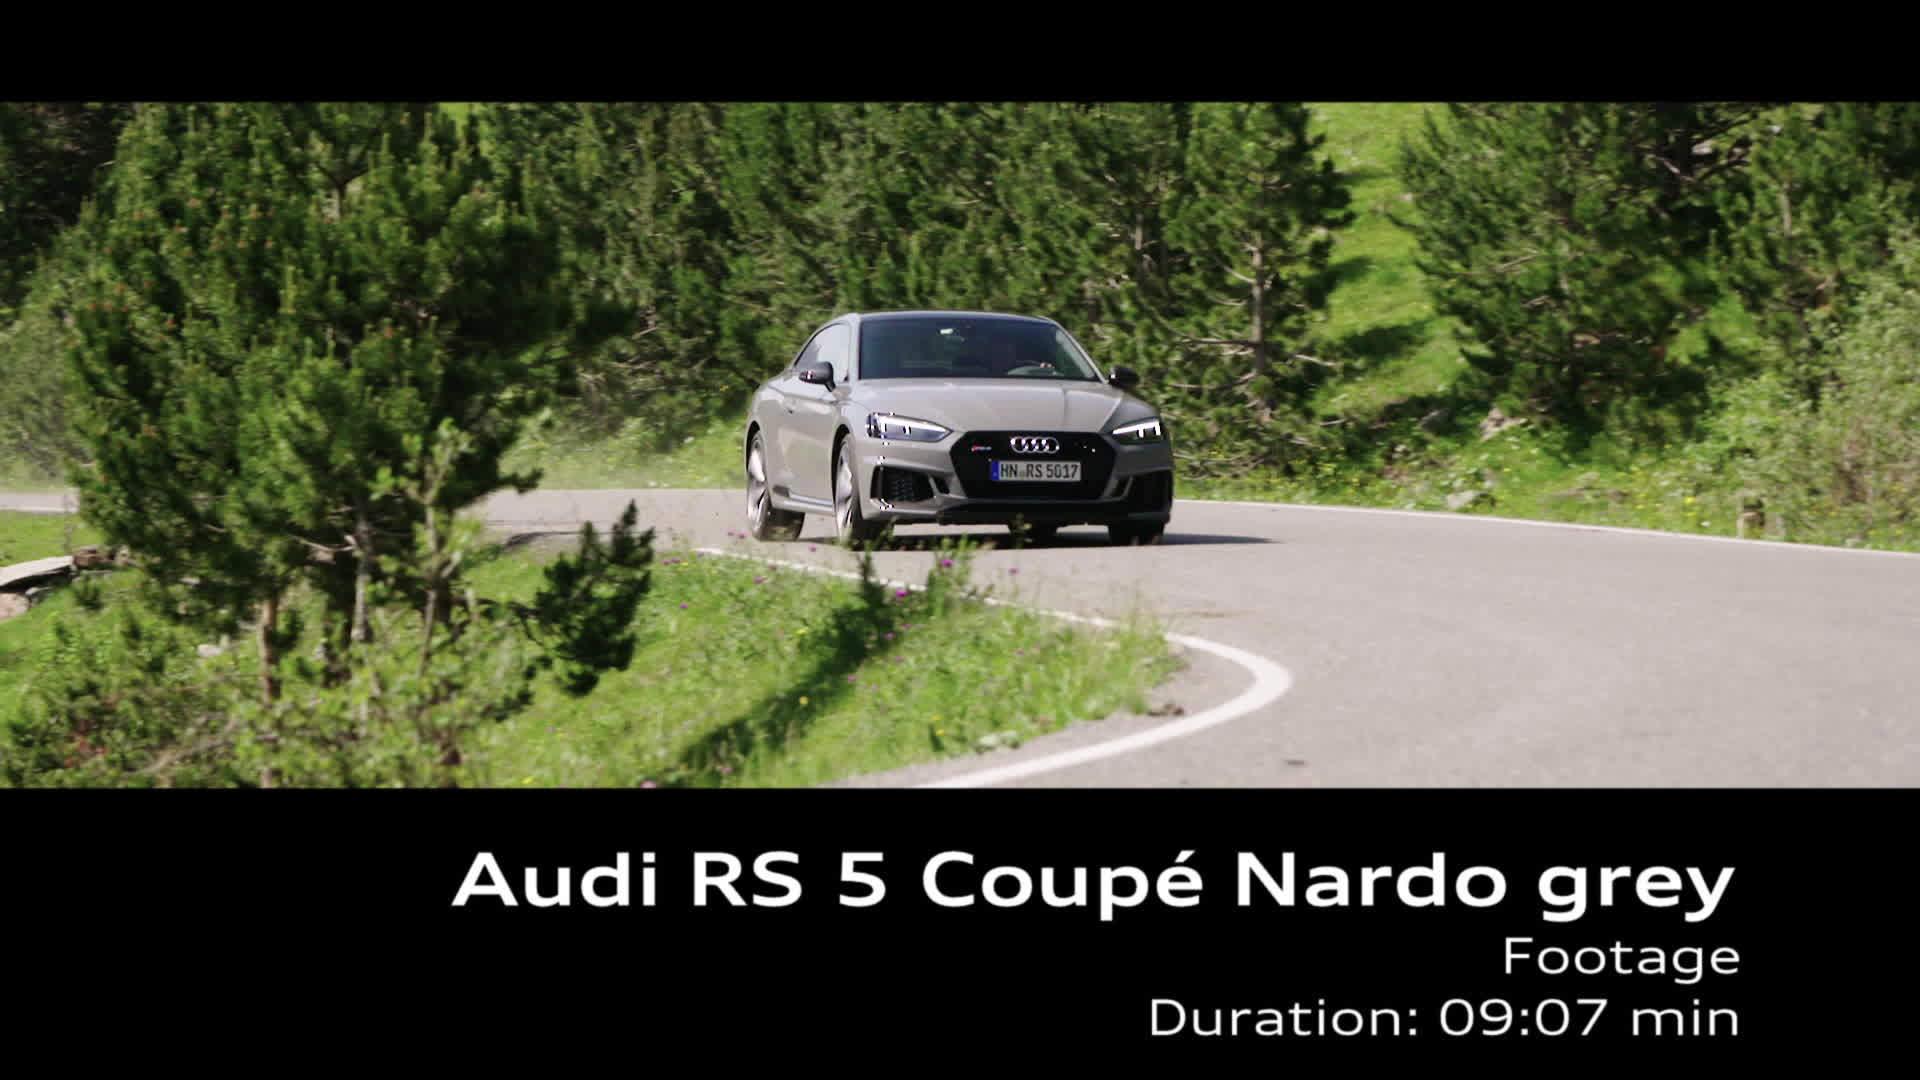 Audi RS 5 Coupé Nardograu - Footage on Location Andorra